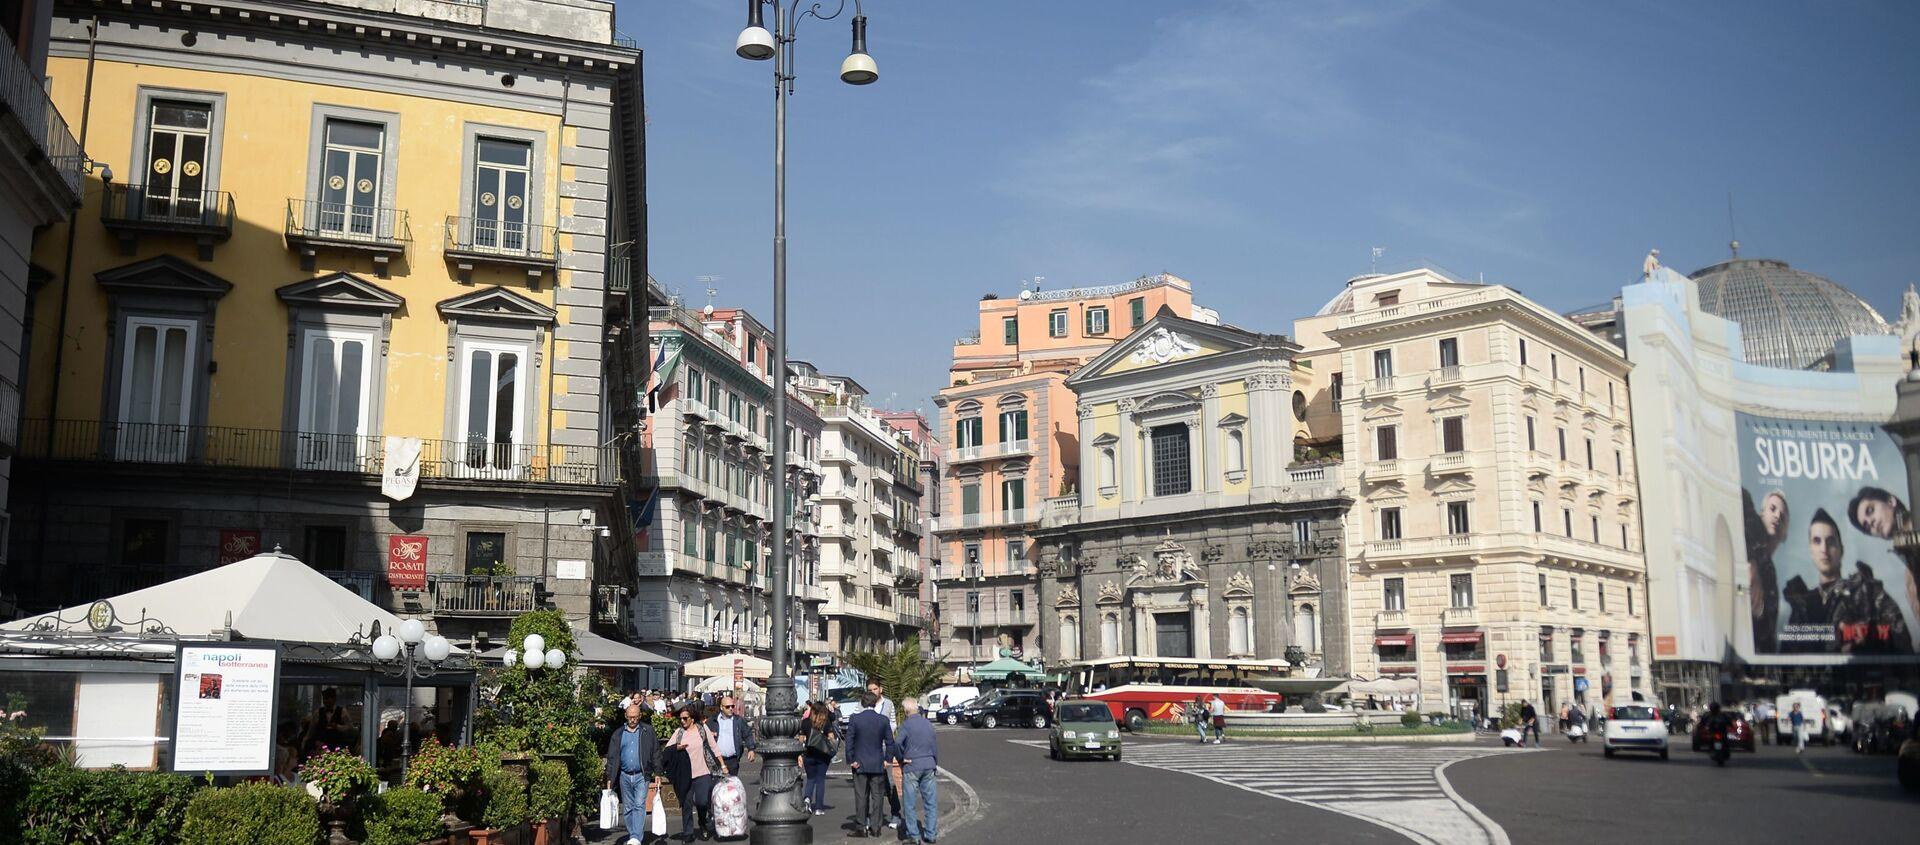 Napoli, la Piazza Trieste e Trento - Sputnik Italia, 1920, 31.01.2021